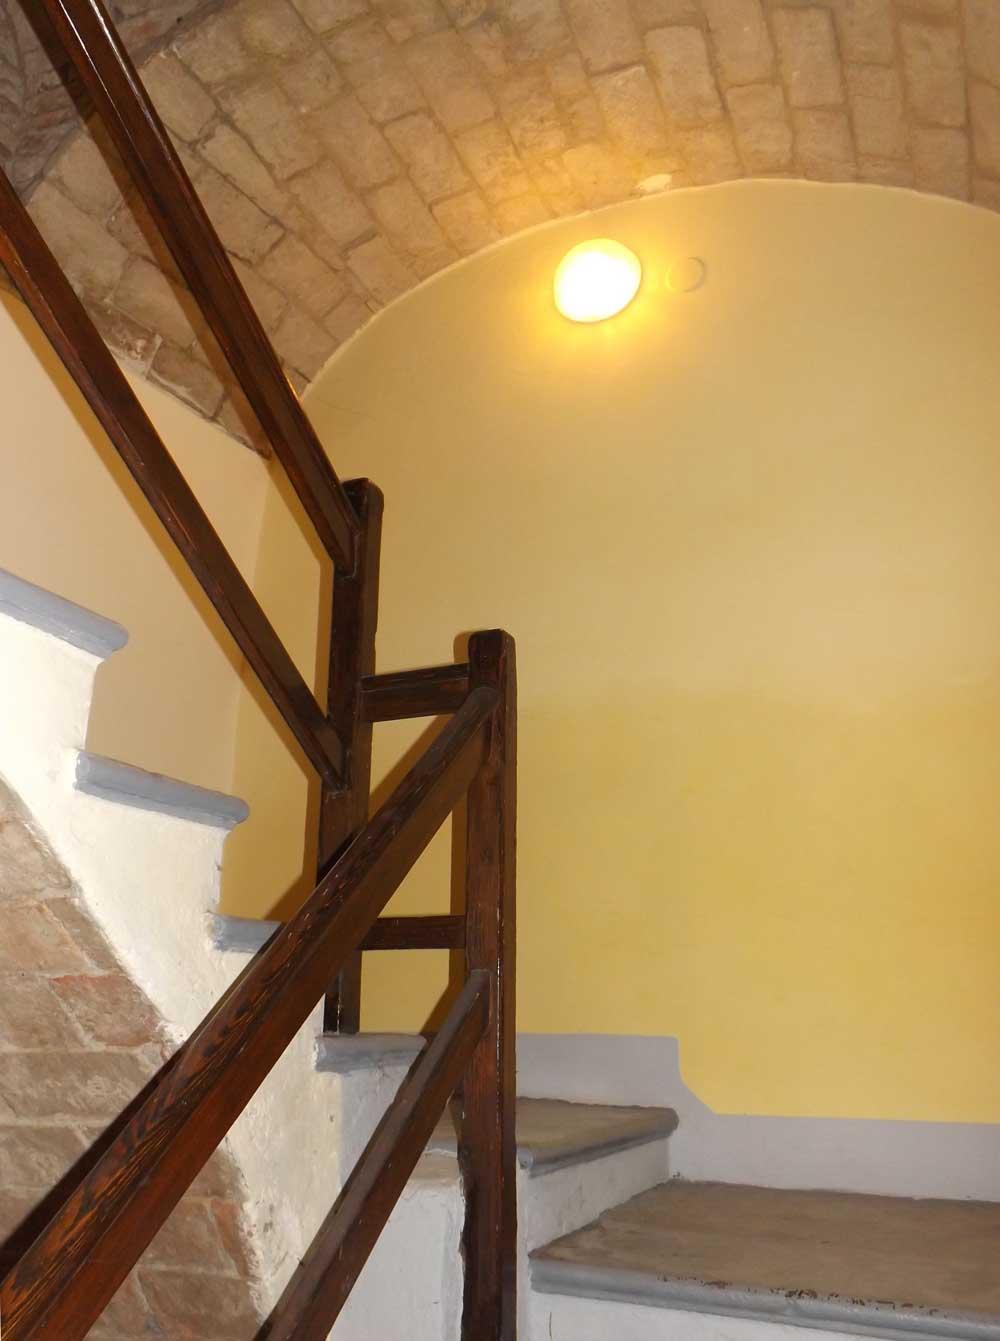 Casa nino bixio affitti temporanei parma for Affitti temporanei milano